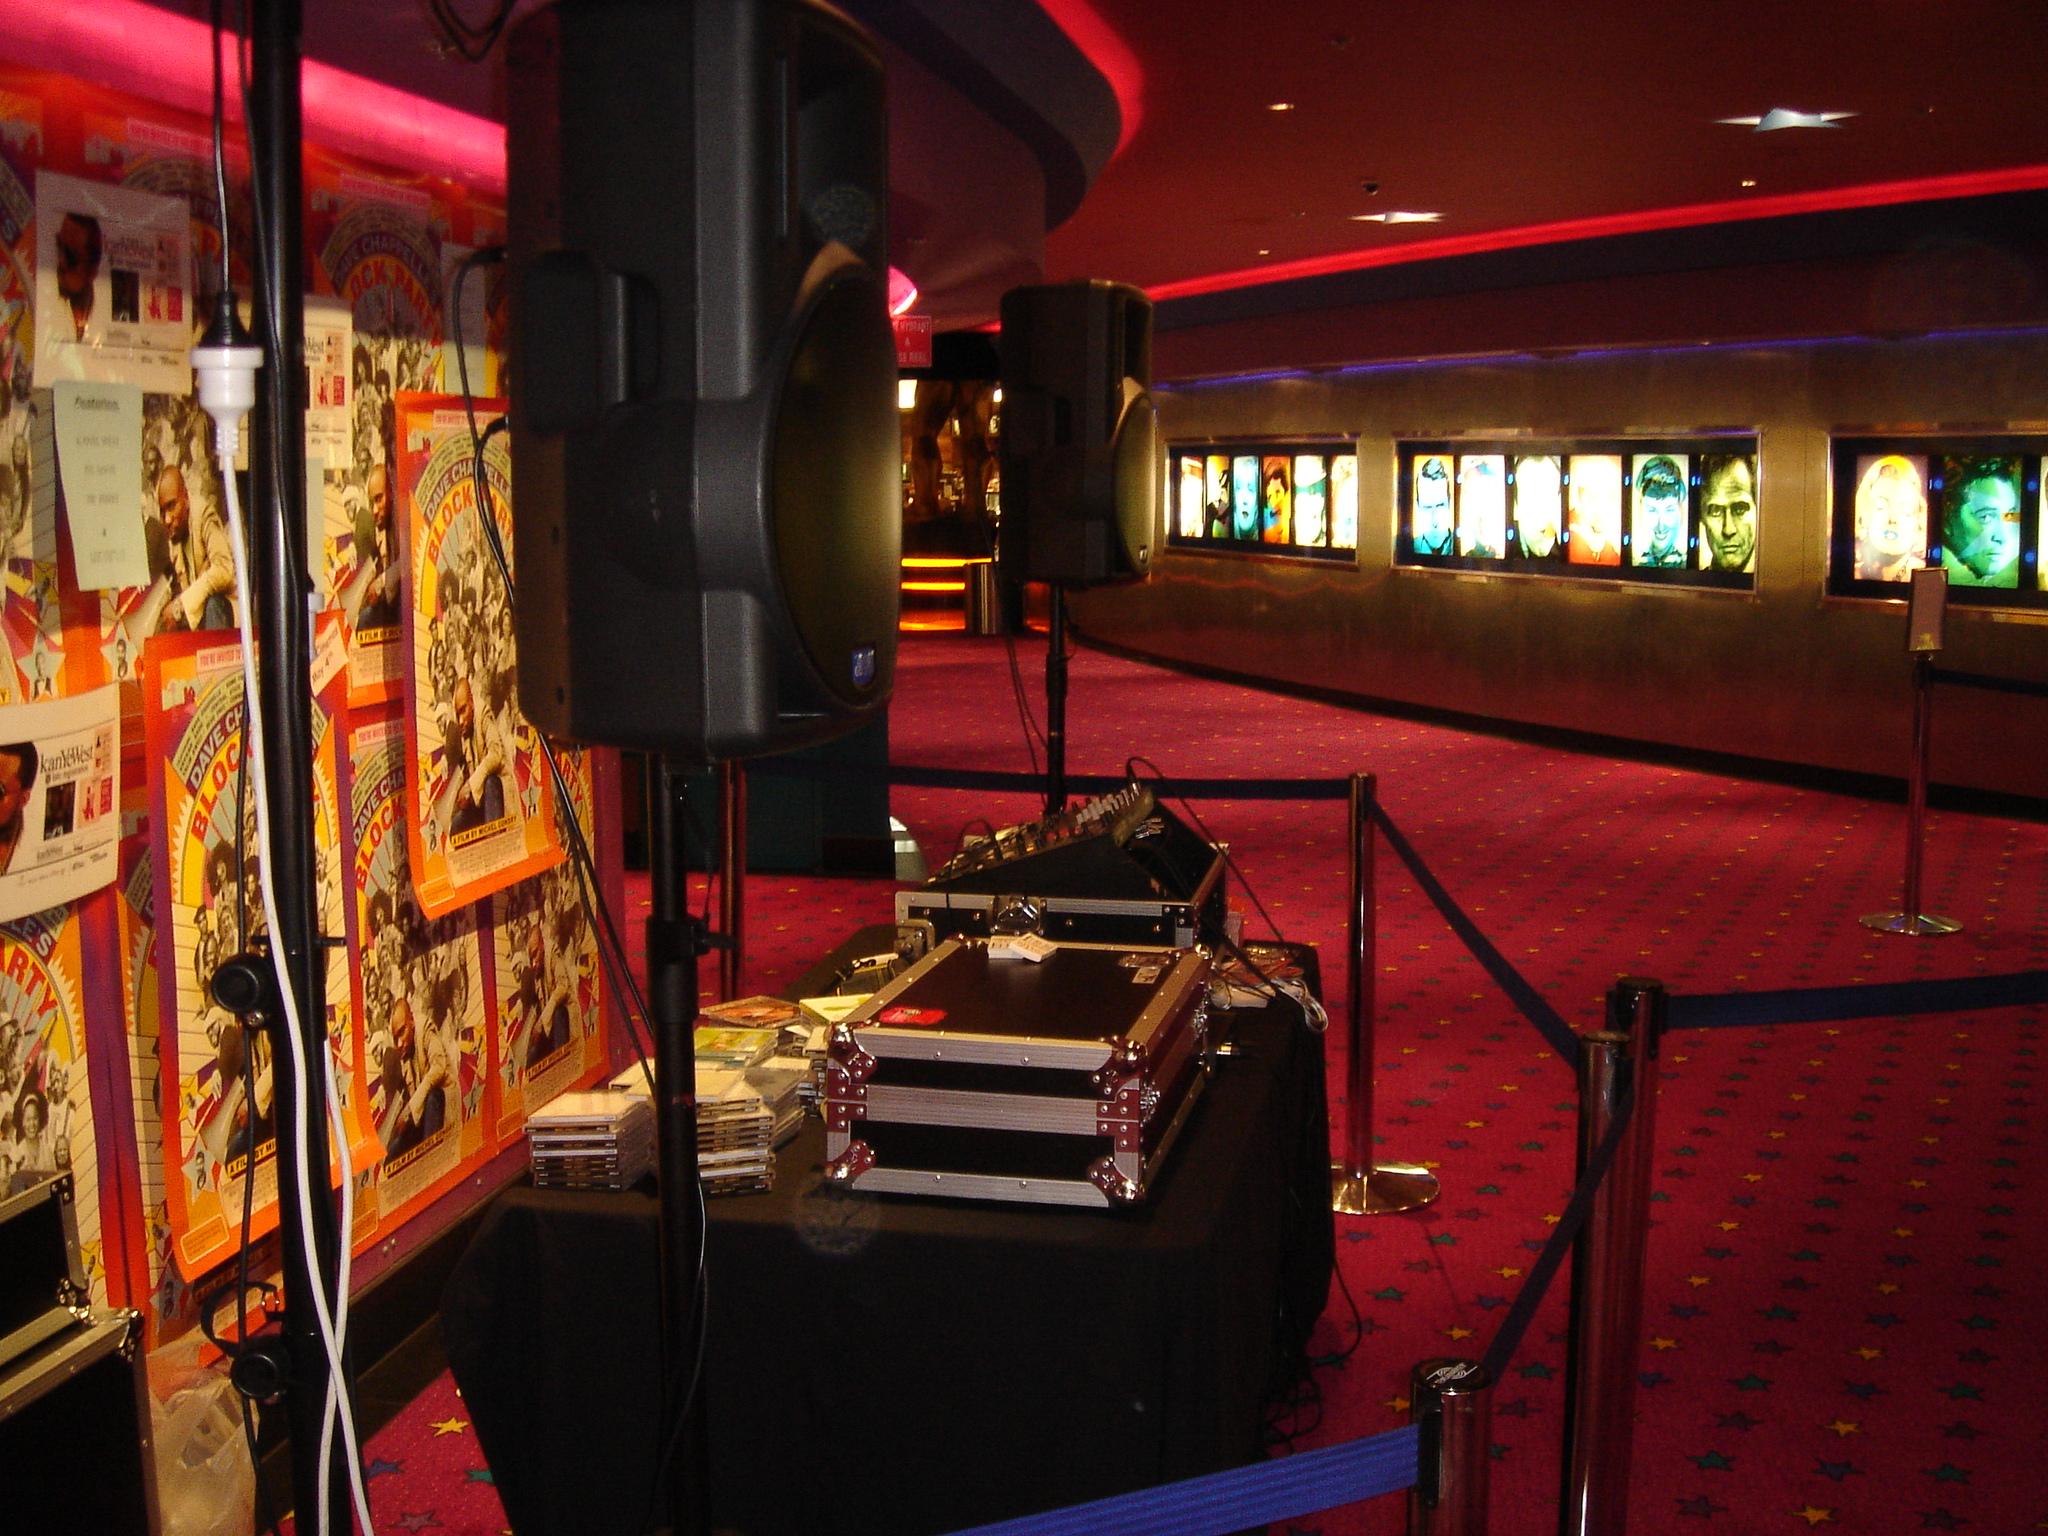 Village Cinema Sth Land - Block Party Promo 21st April 2006 005.jpg